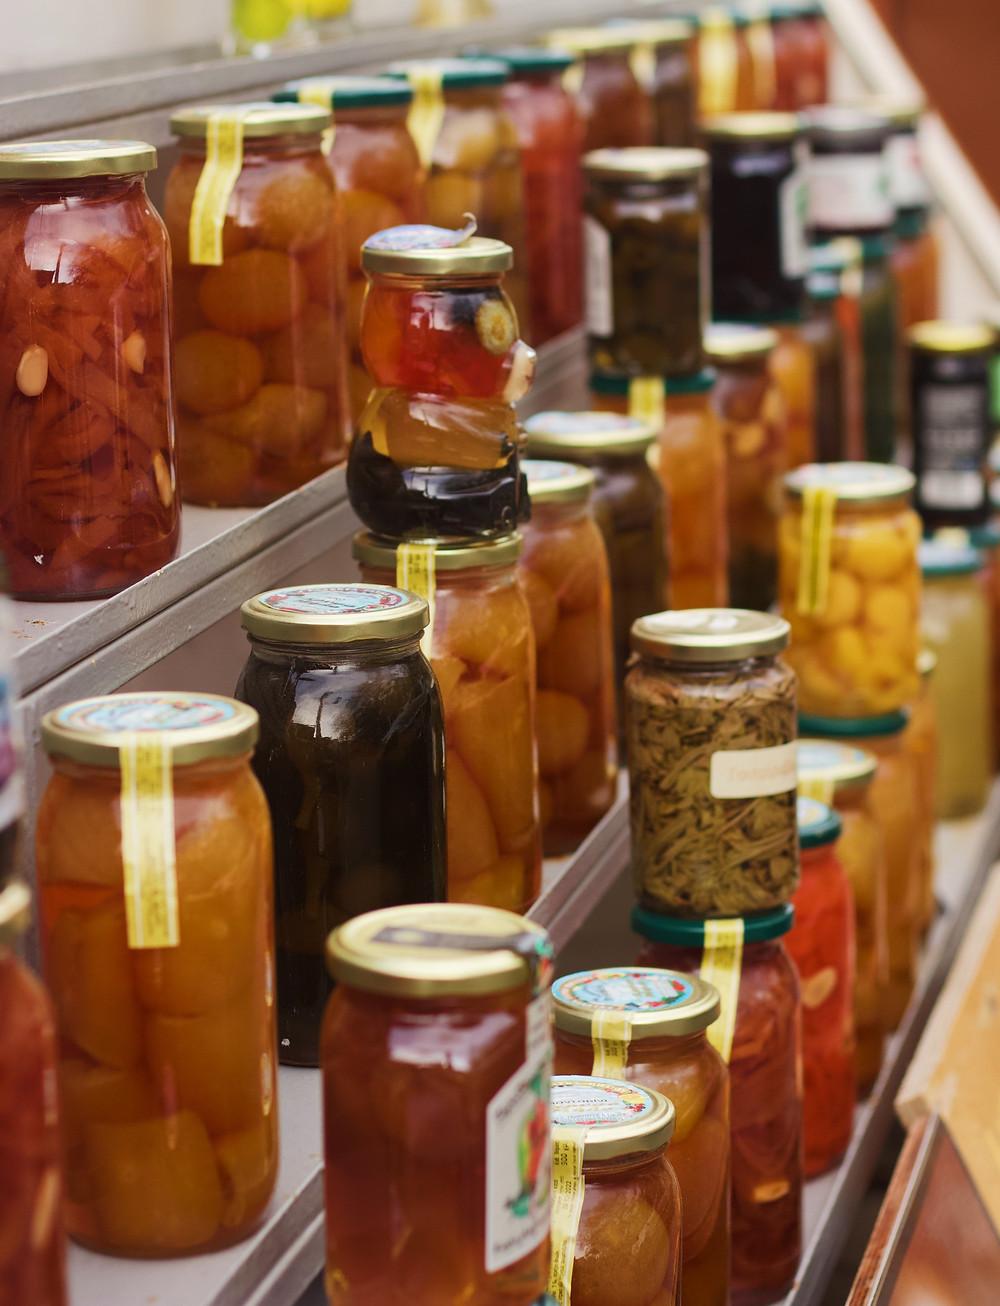 assorted food in jars